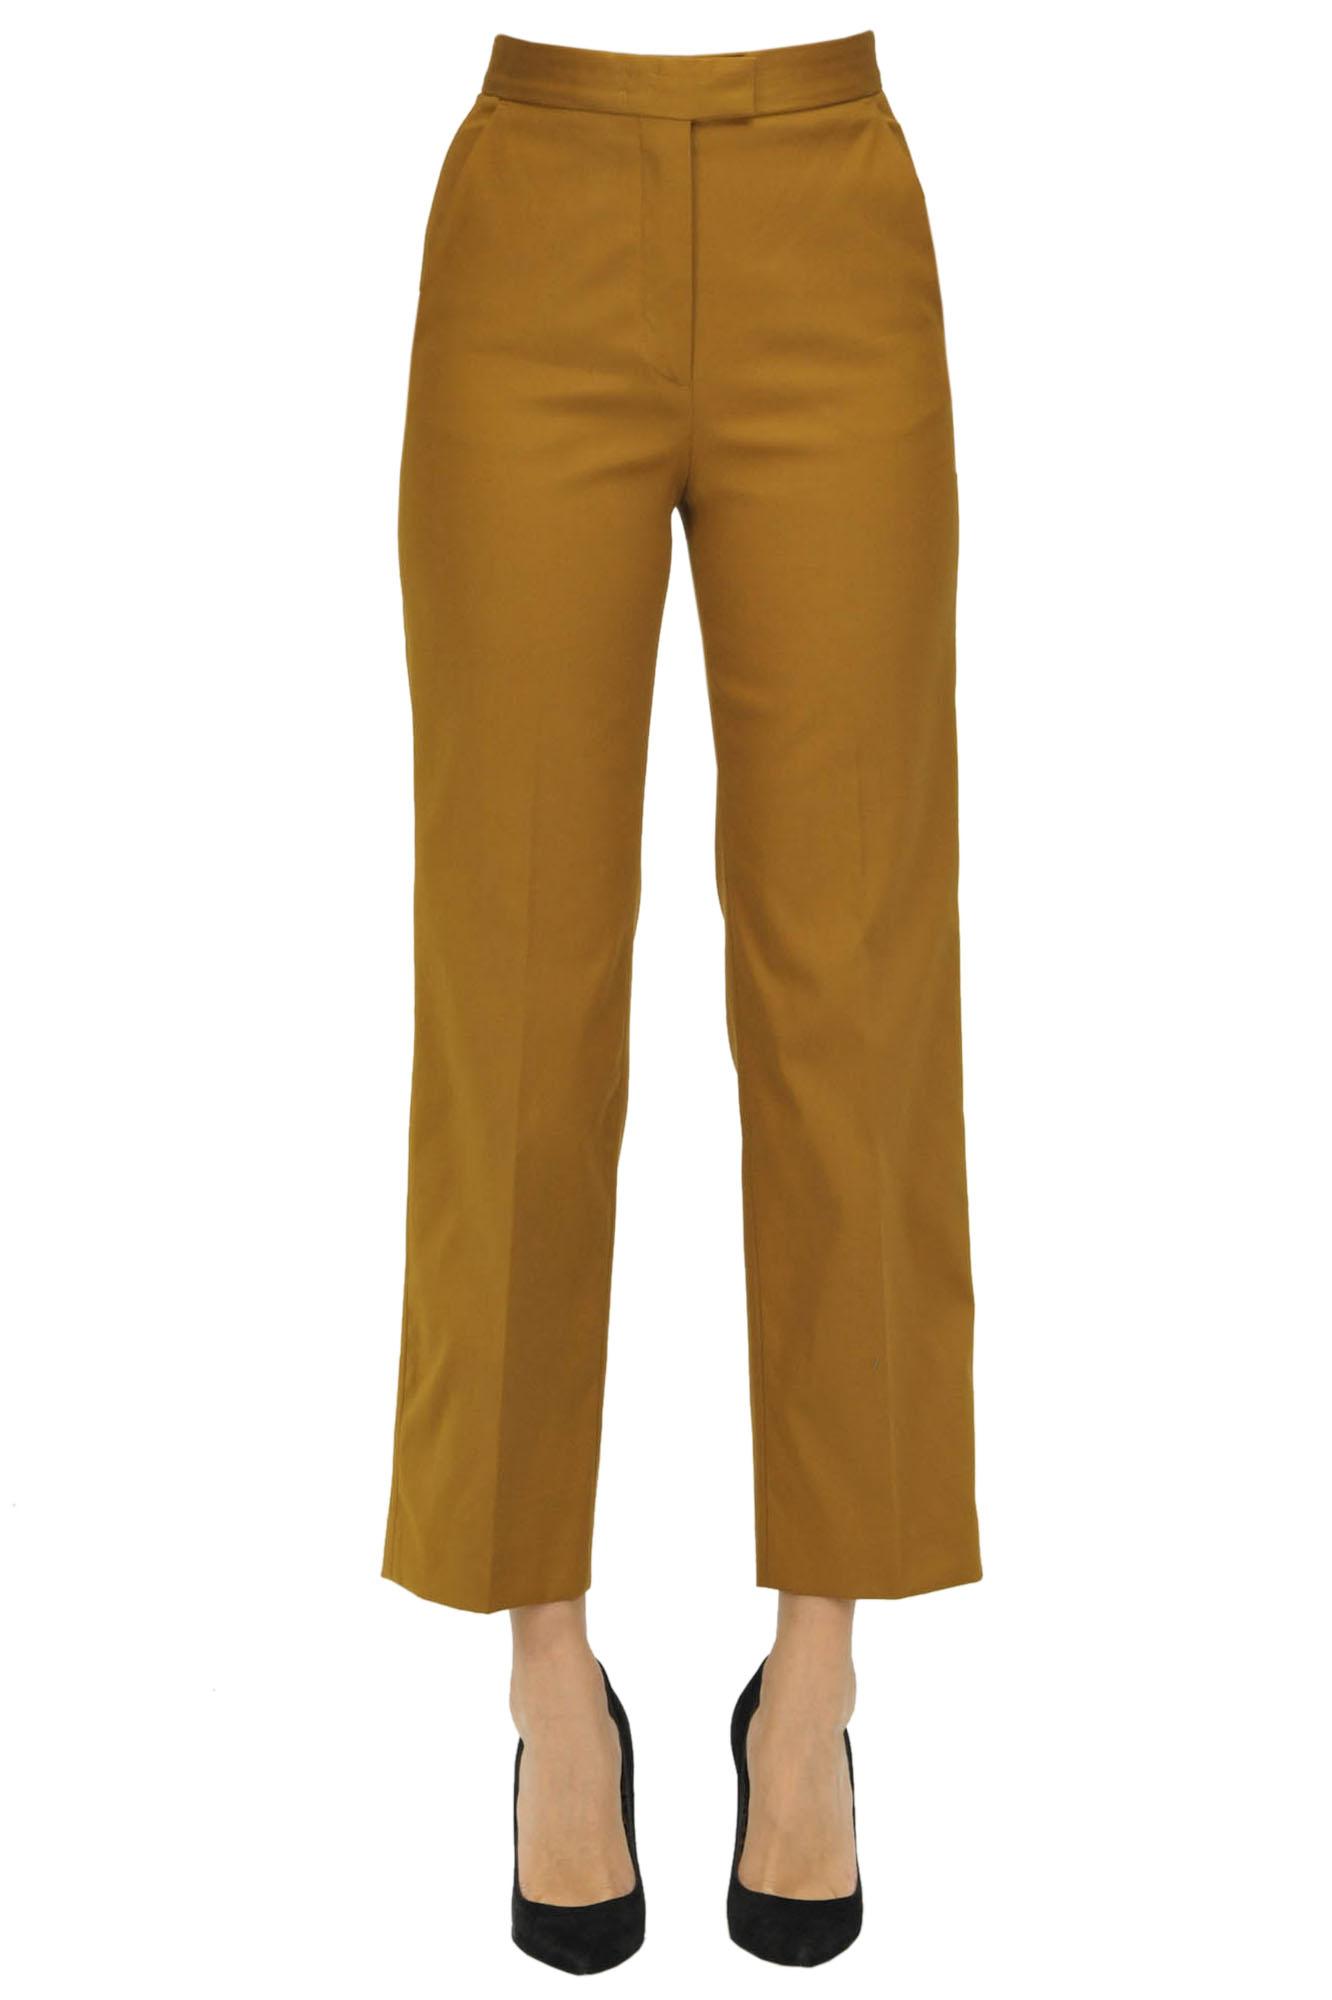 Image of Pantaloni in cotone